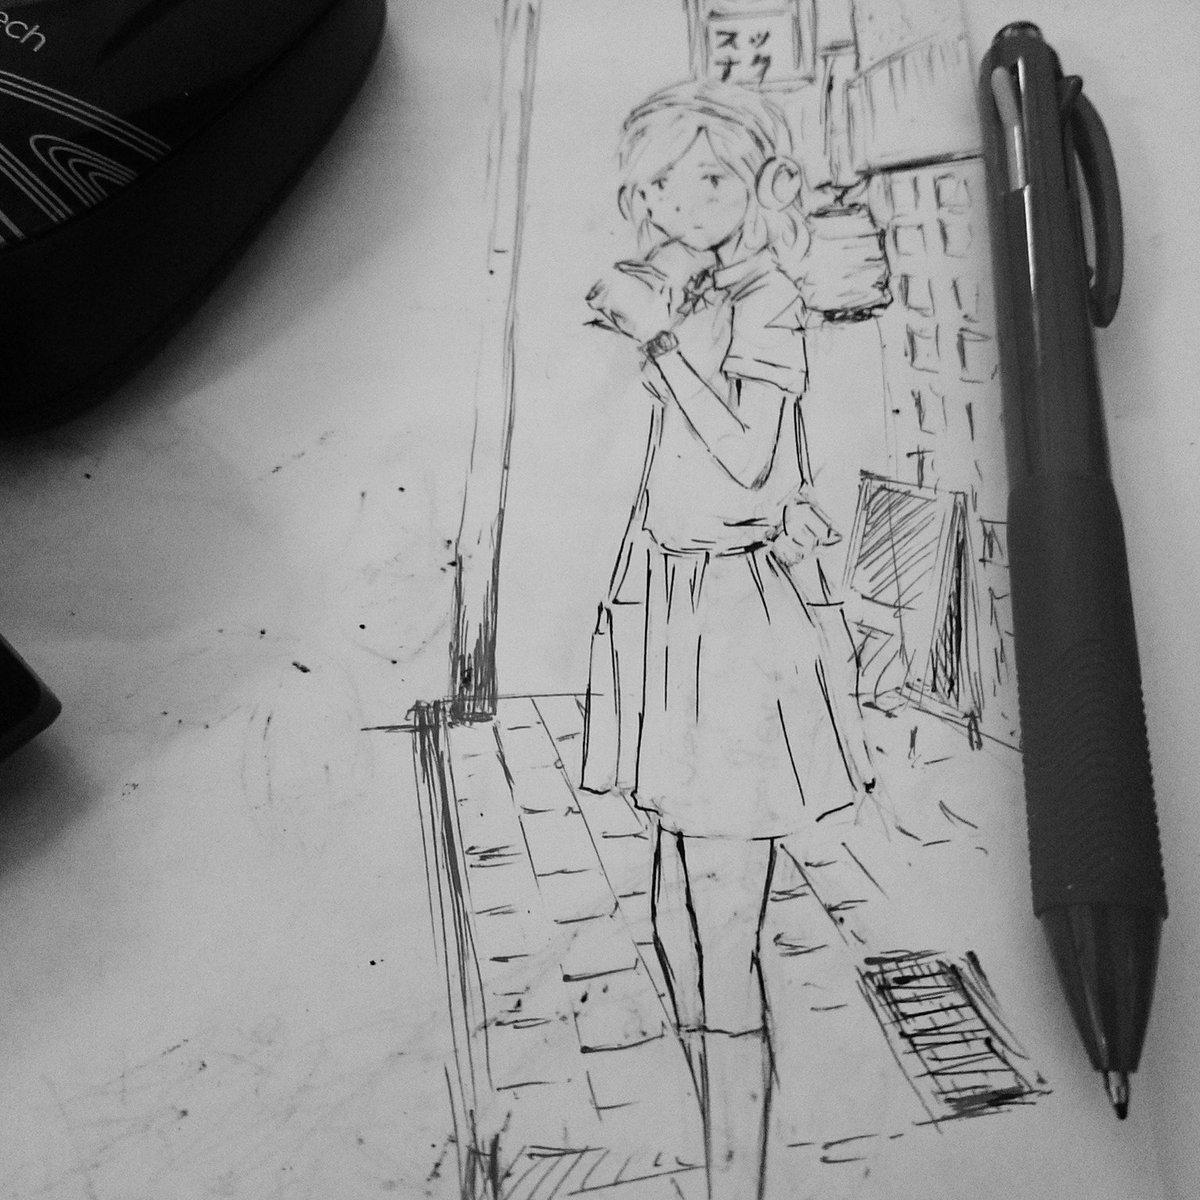 Quand les réunions sont trop longues #model #fashion #drawing #dessin #illustration #イラスト #絵 #おんなの子  #artwork #artsy #love #life <br>http://pic.twitter.com/Eefjn2OTRj